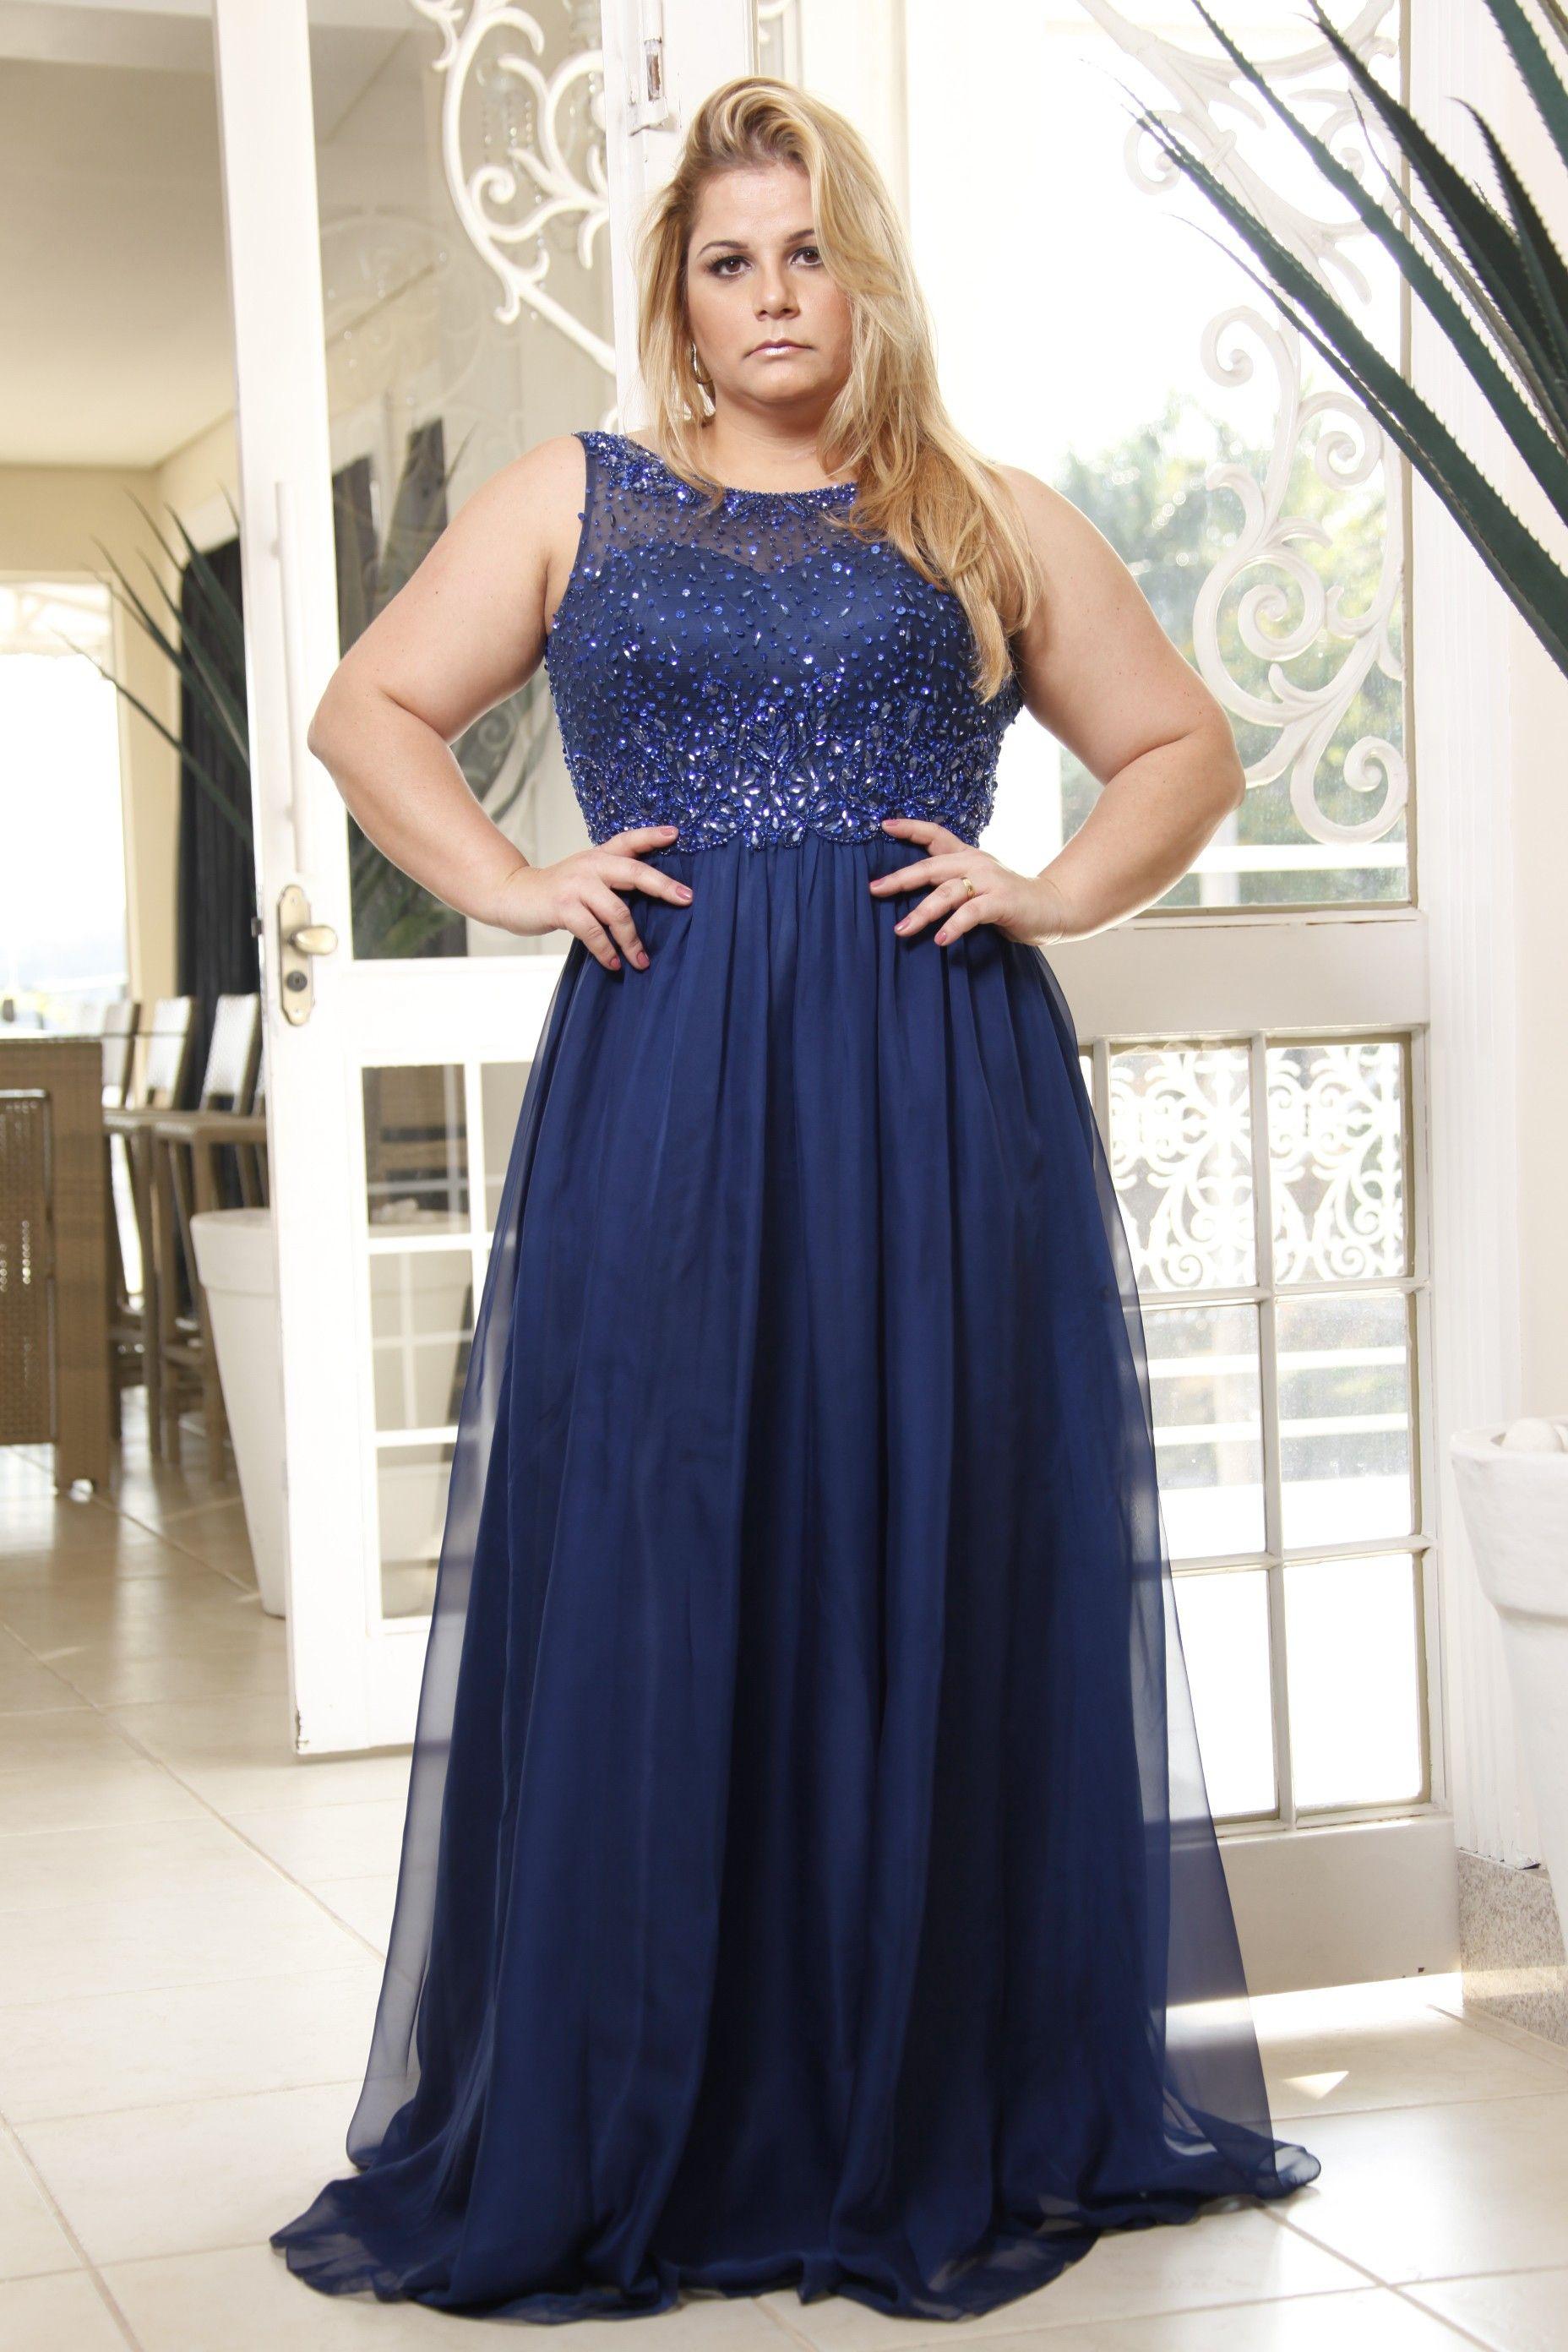 SP02994 VESTIDO LONGO | vestidos de festa plus size | Pinterest ...